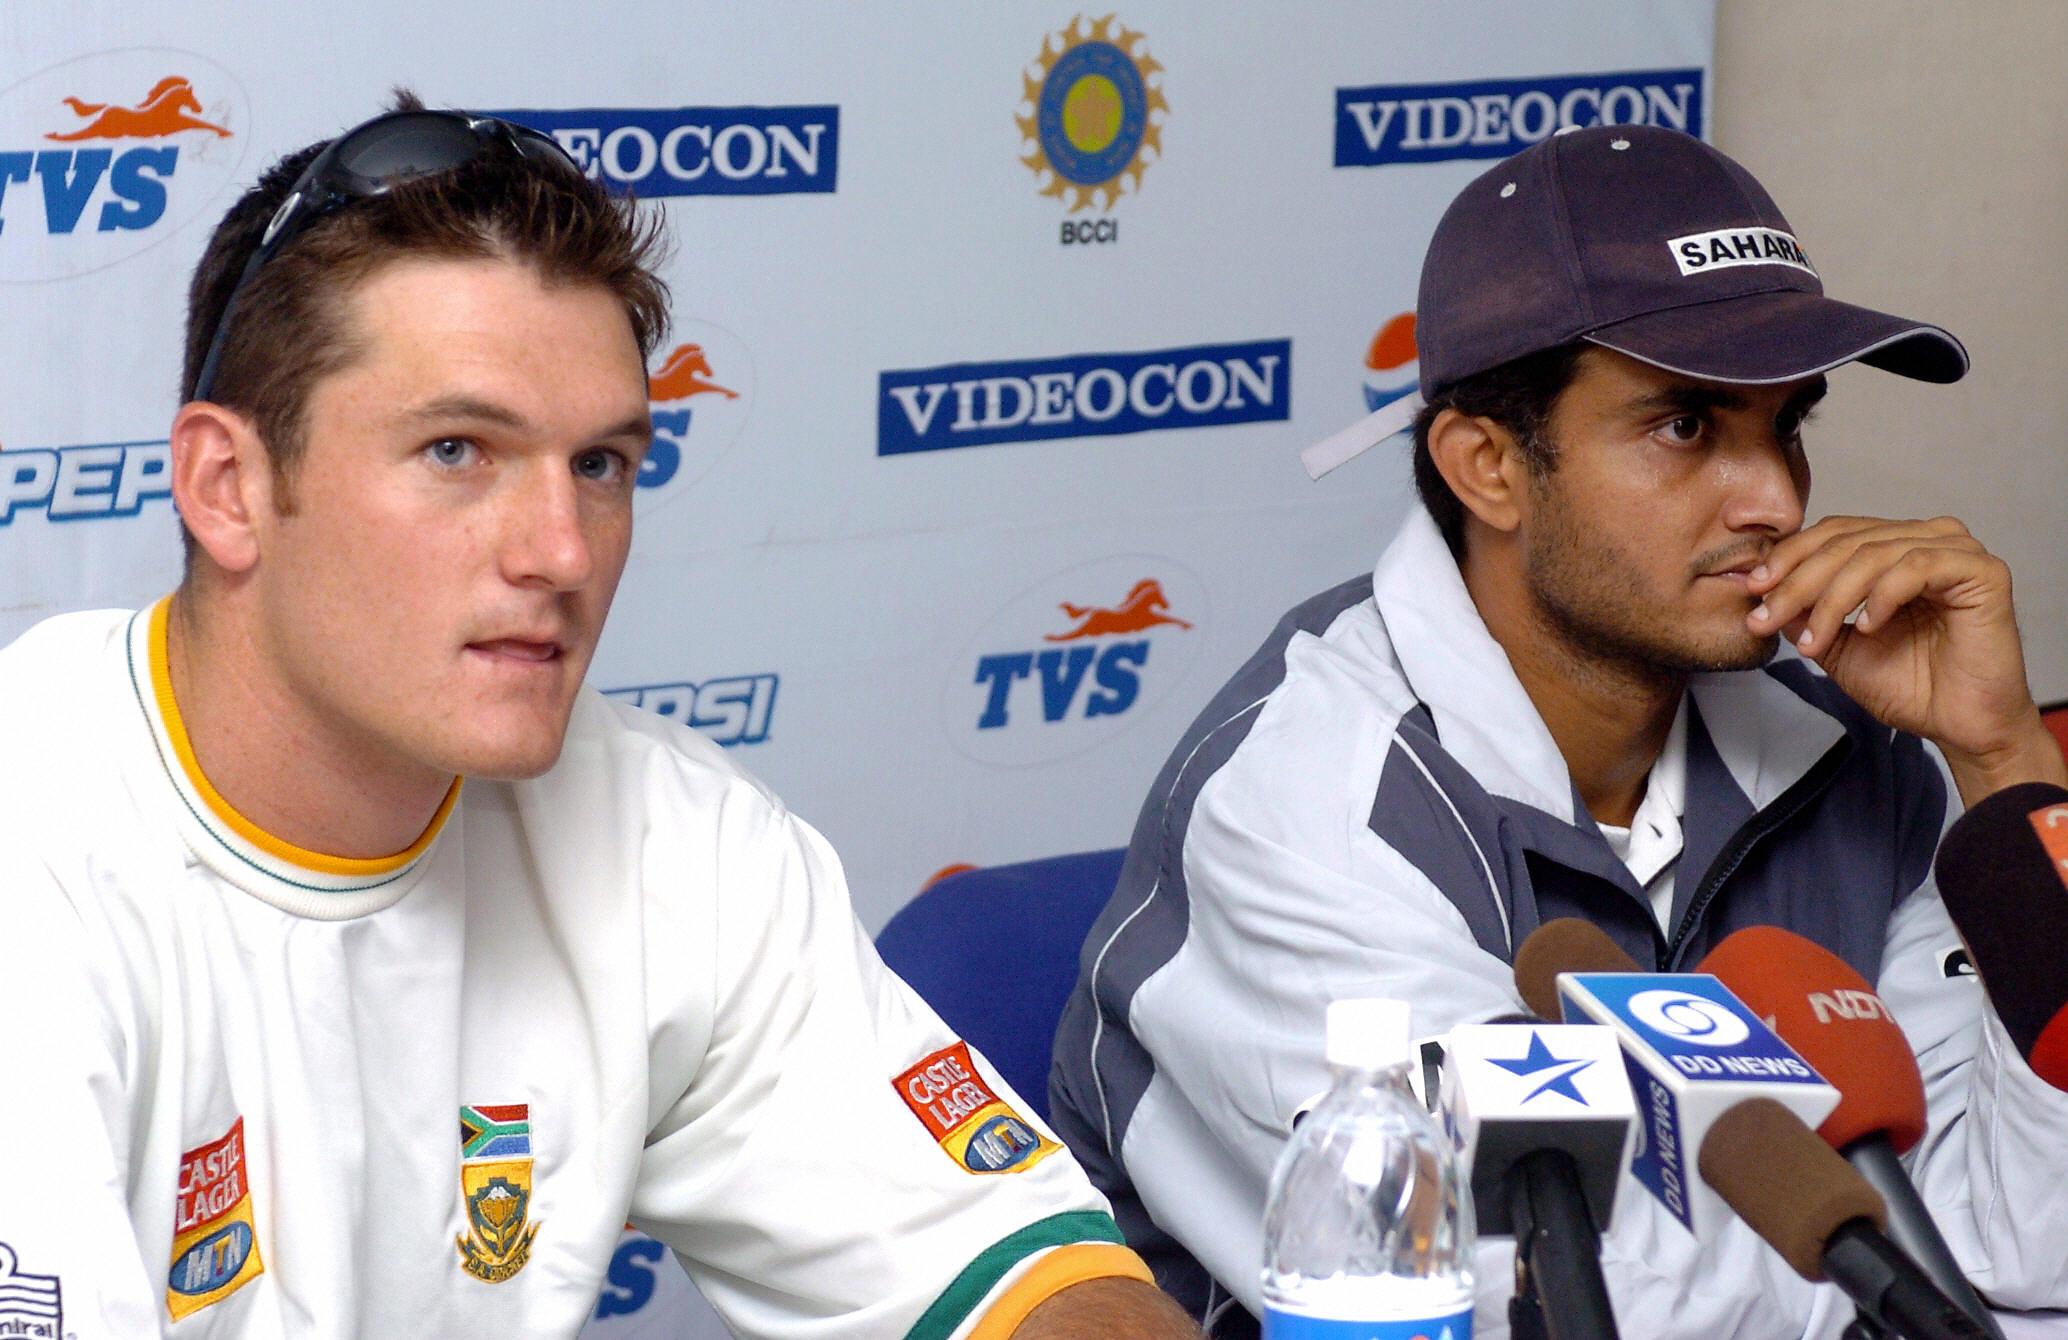 Graeme Smith (L) and Sourav Ganguly (R)  (PRAKASH SINGH/AFP via Getty Images)